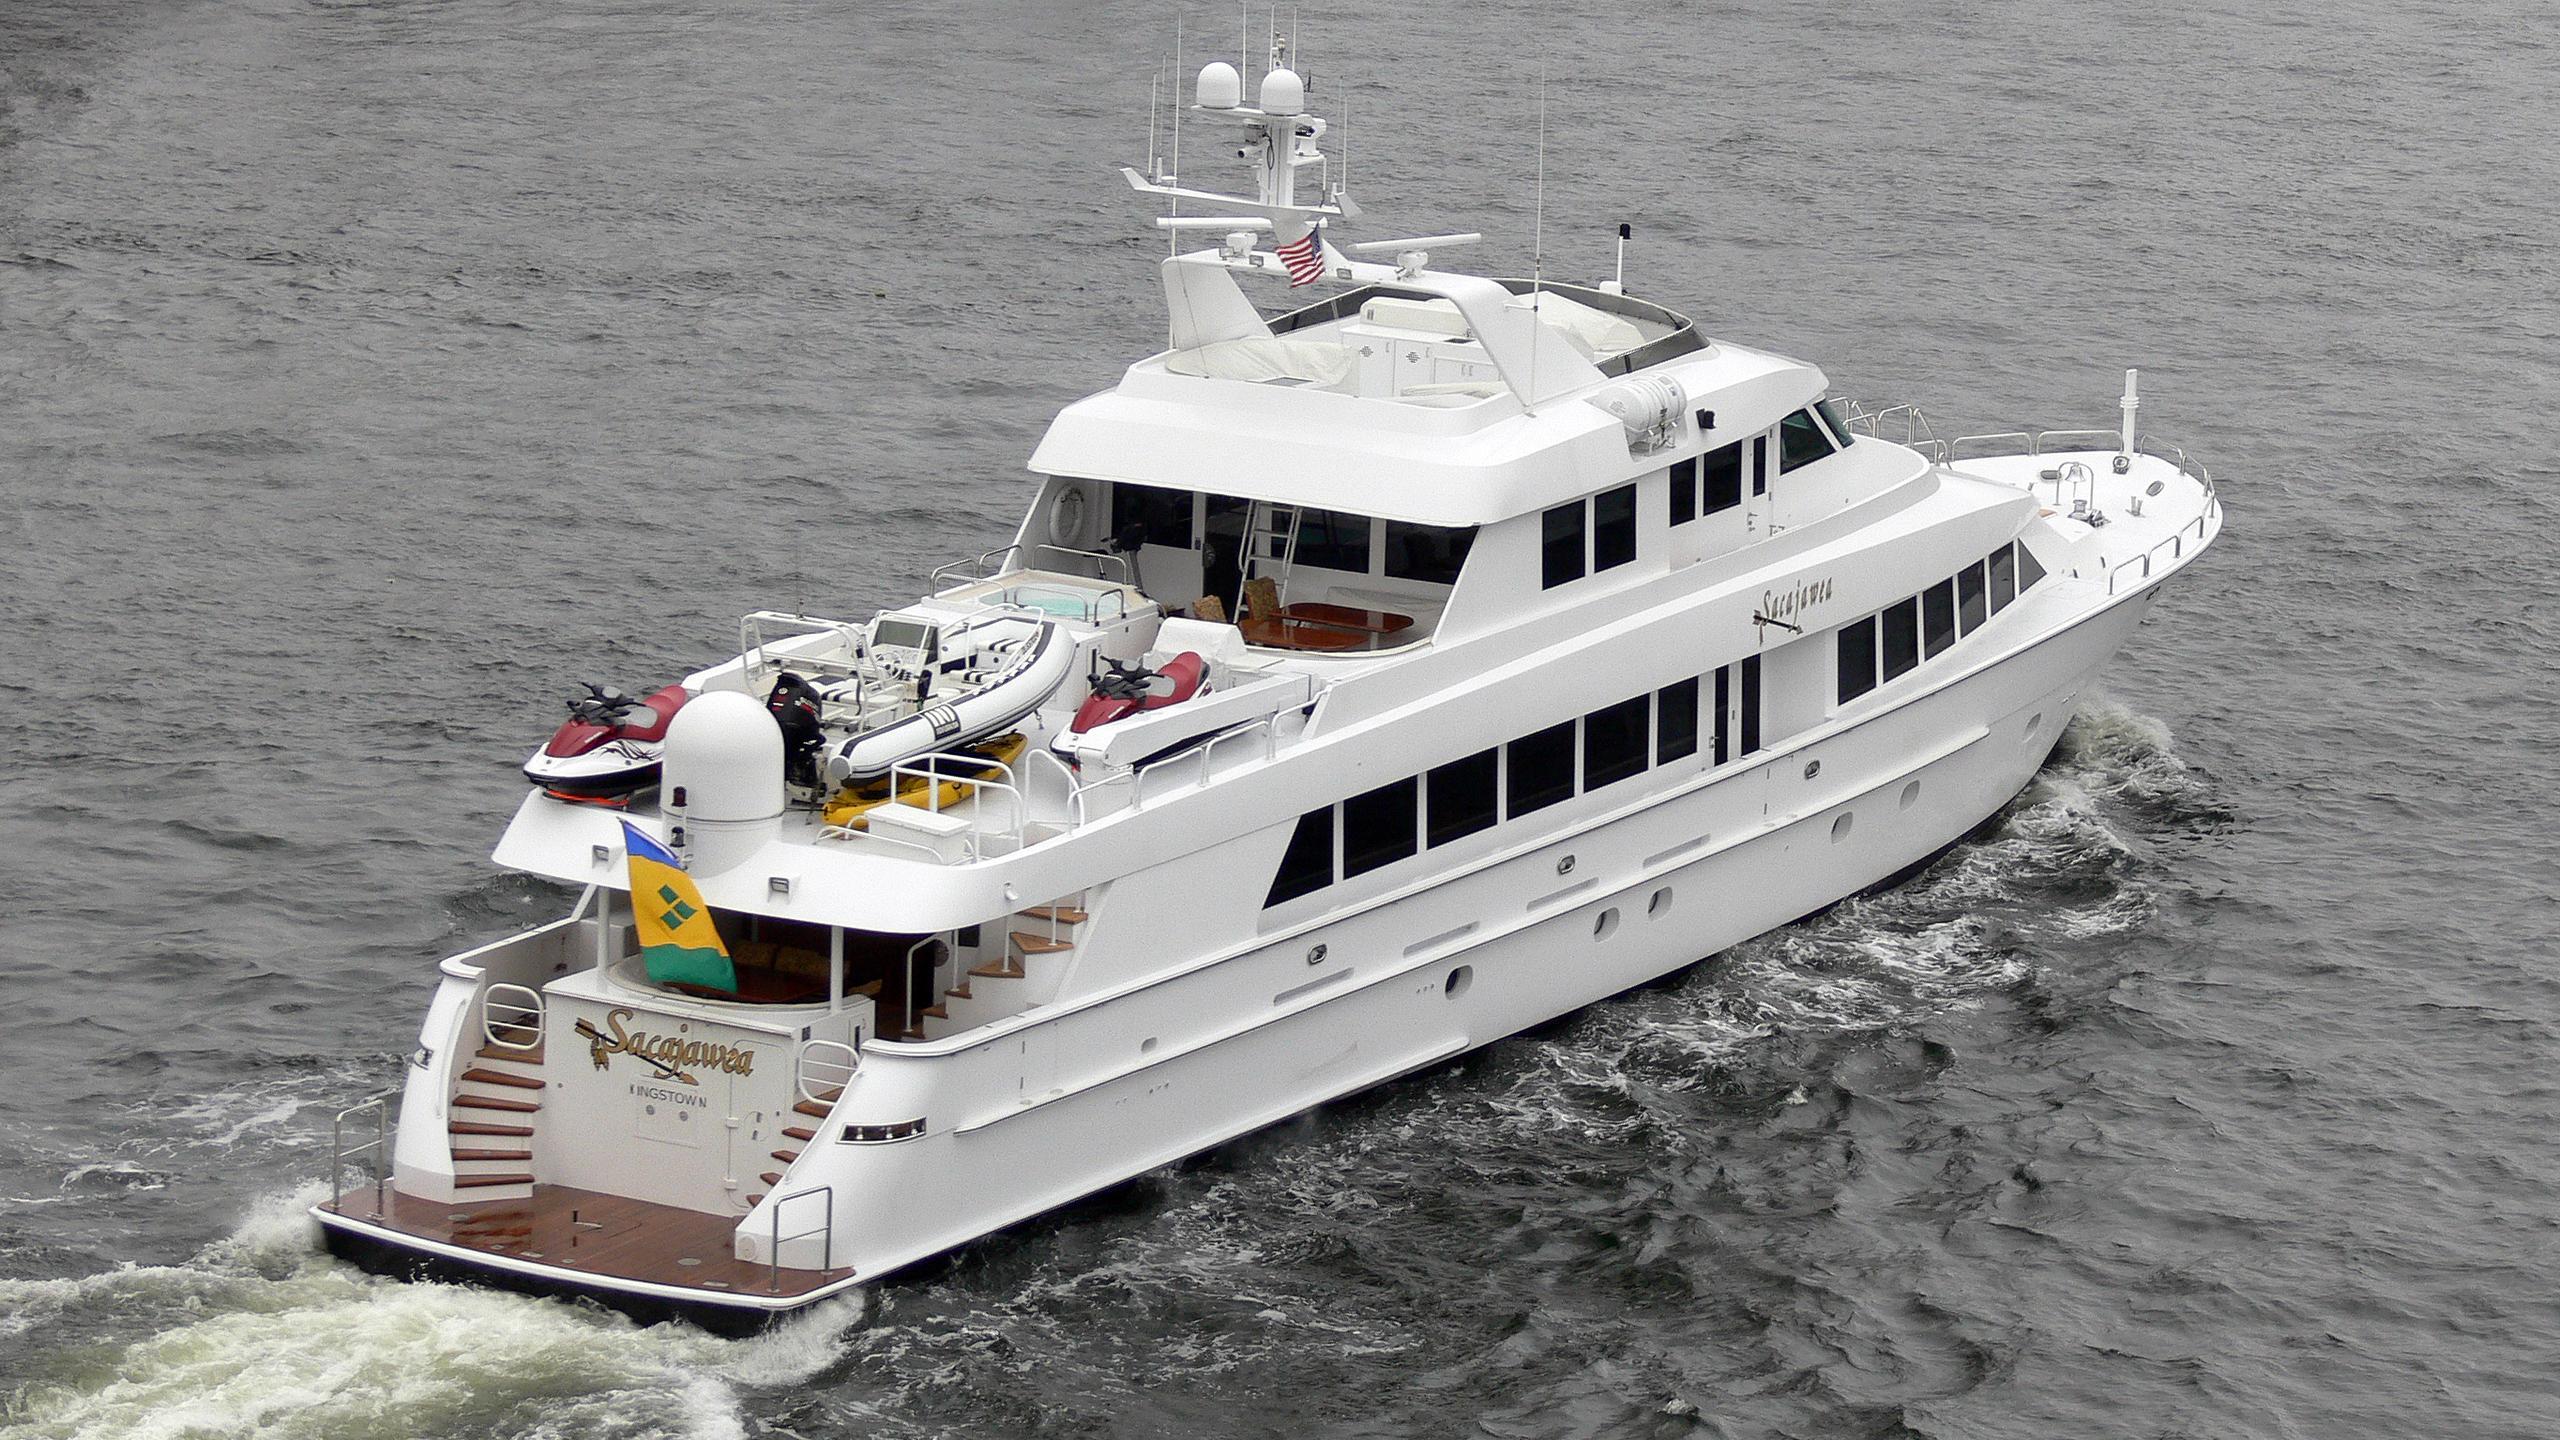 tranquillity-motor-yacht-hatteras-130-1995-40m-cruising